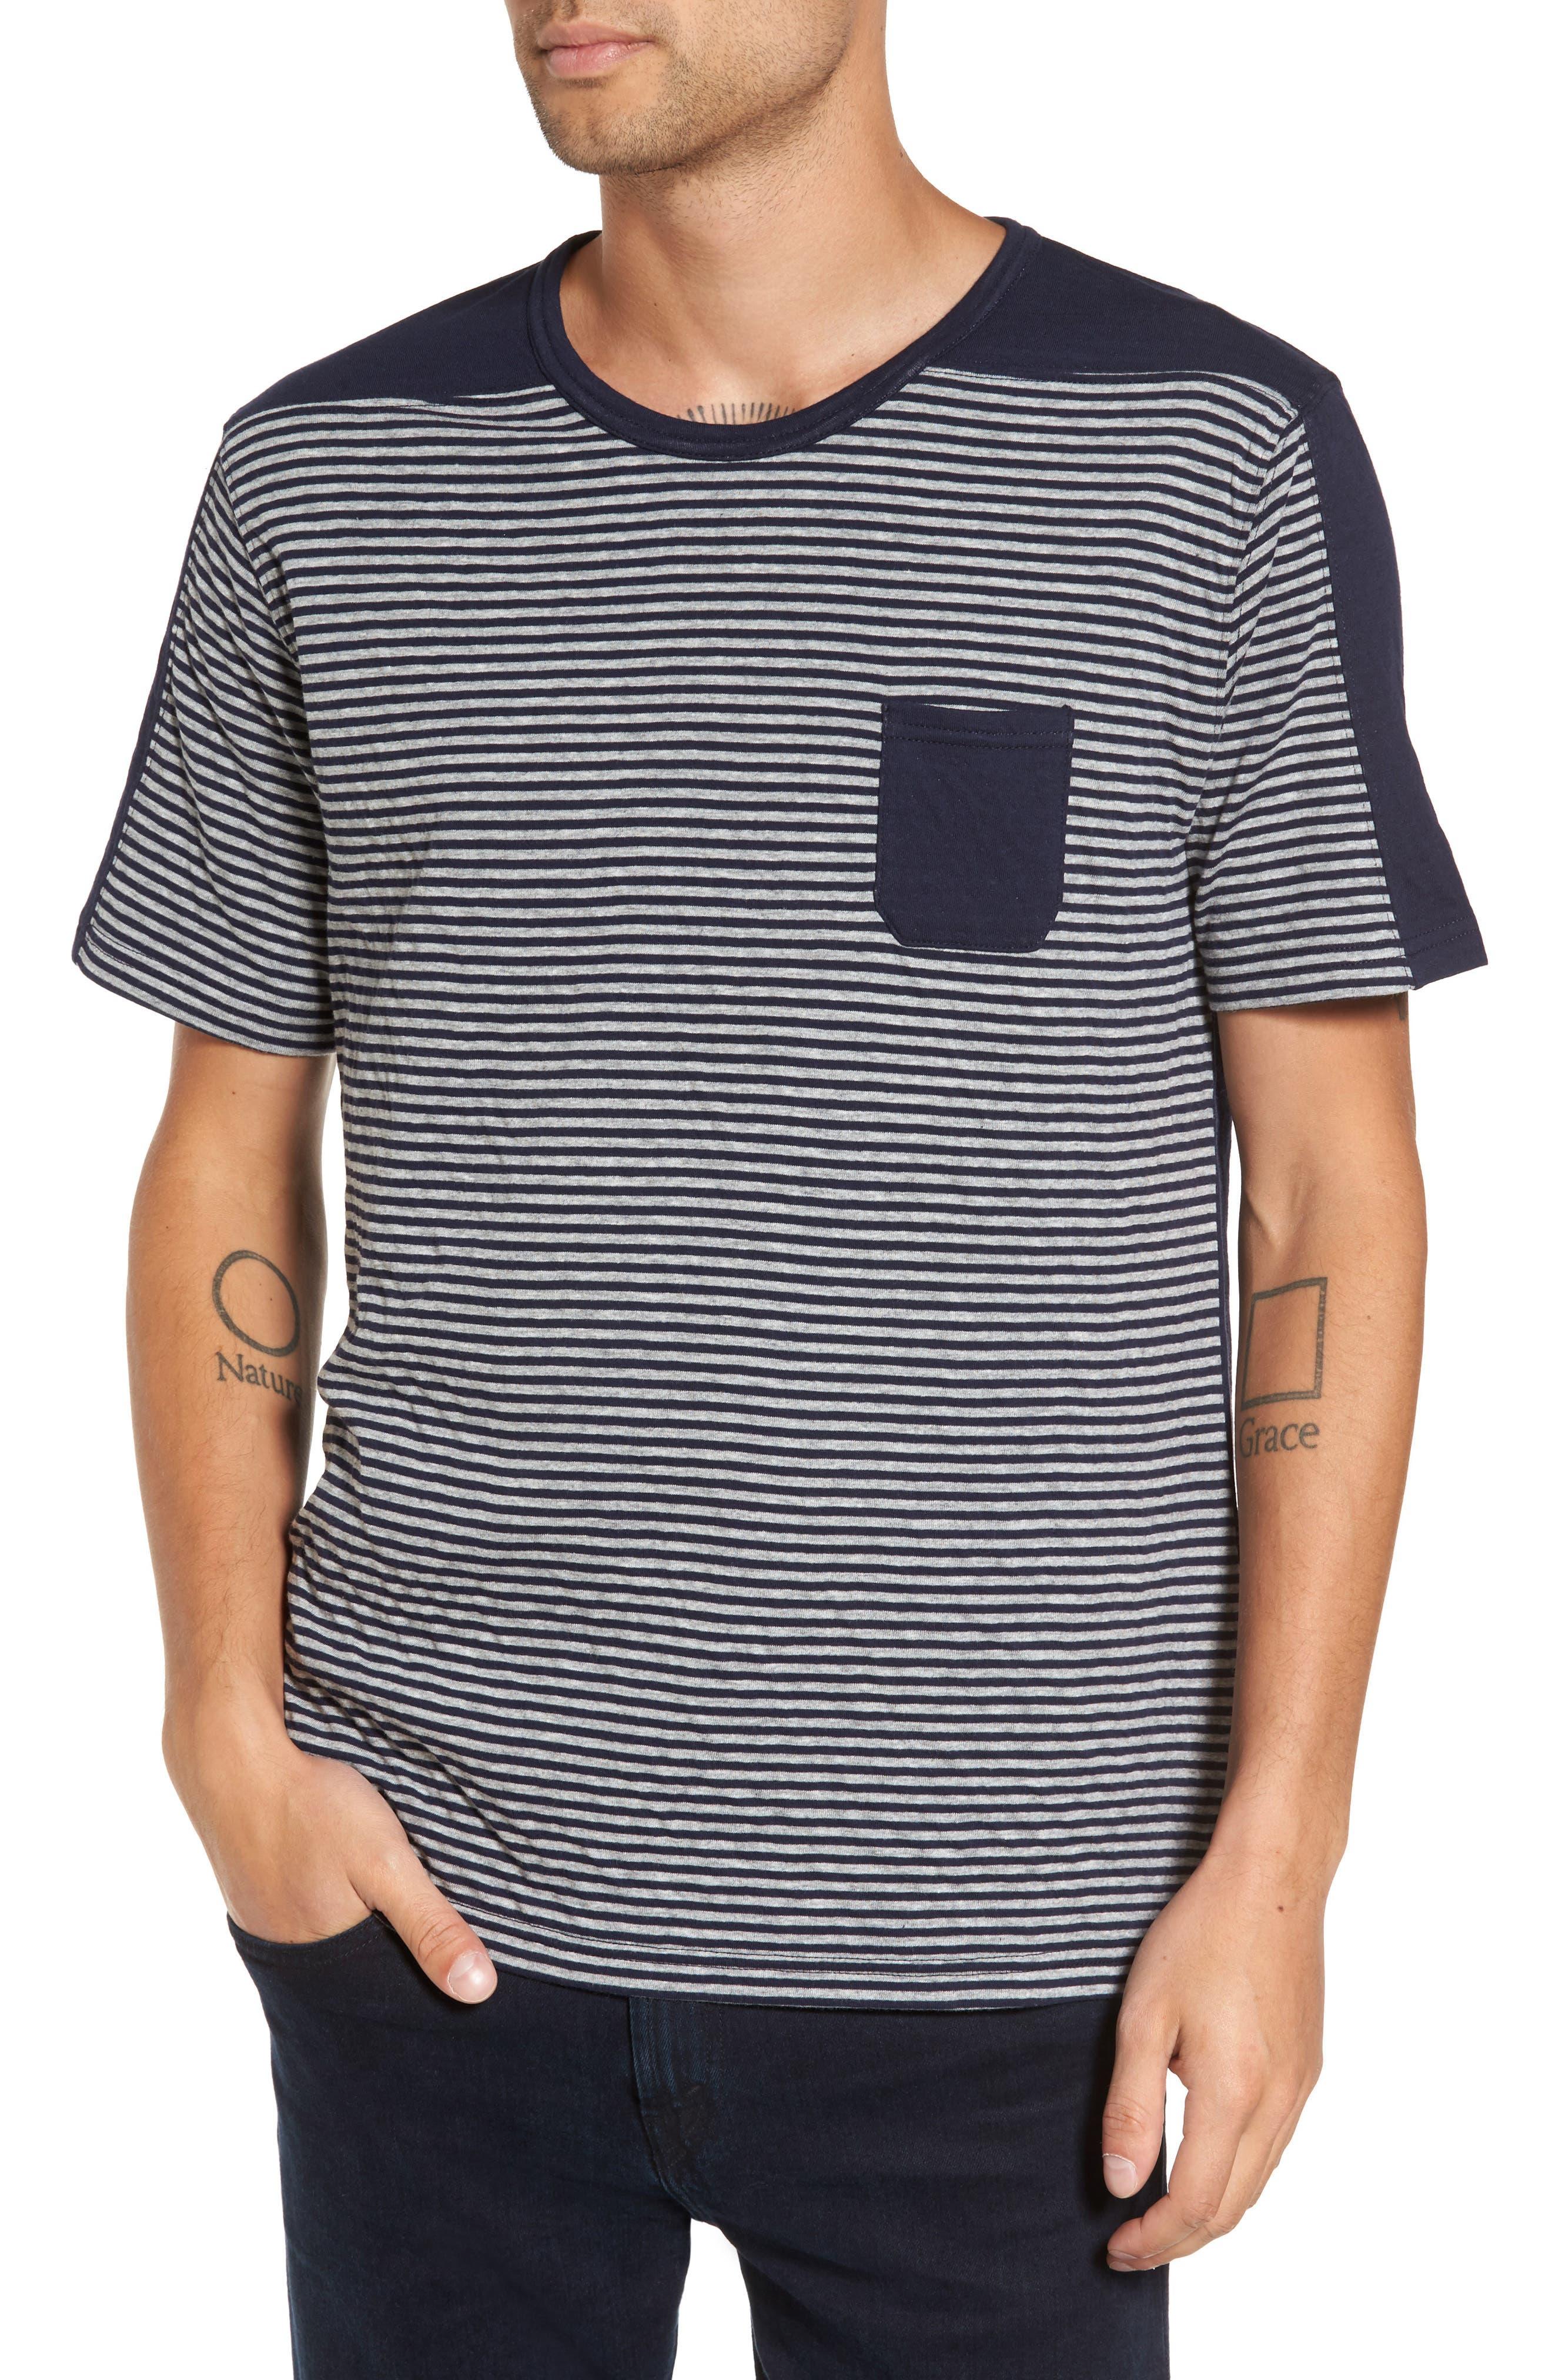 Alternate Image 1 Selected - Slate & Stone Striped Pocket T-Shirt